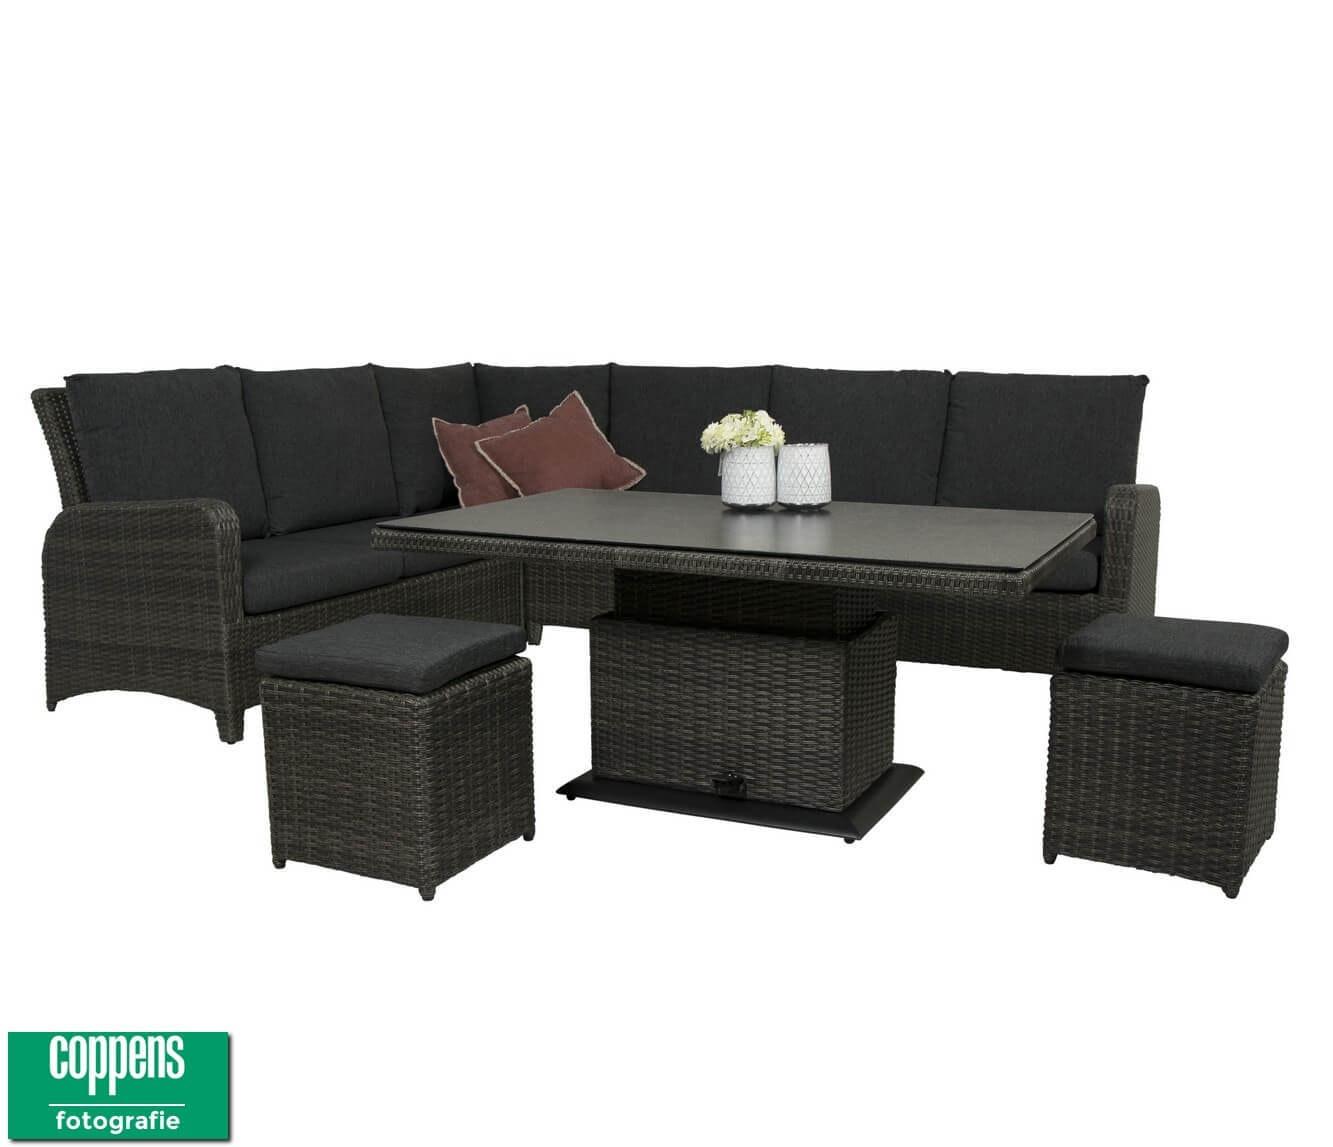 Exclusief Aruba lounge dining set met sandigo vario tafel 140cm DH antraciet